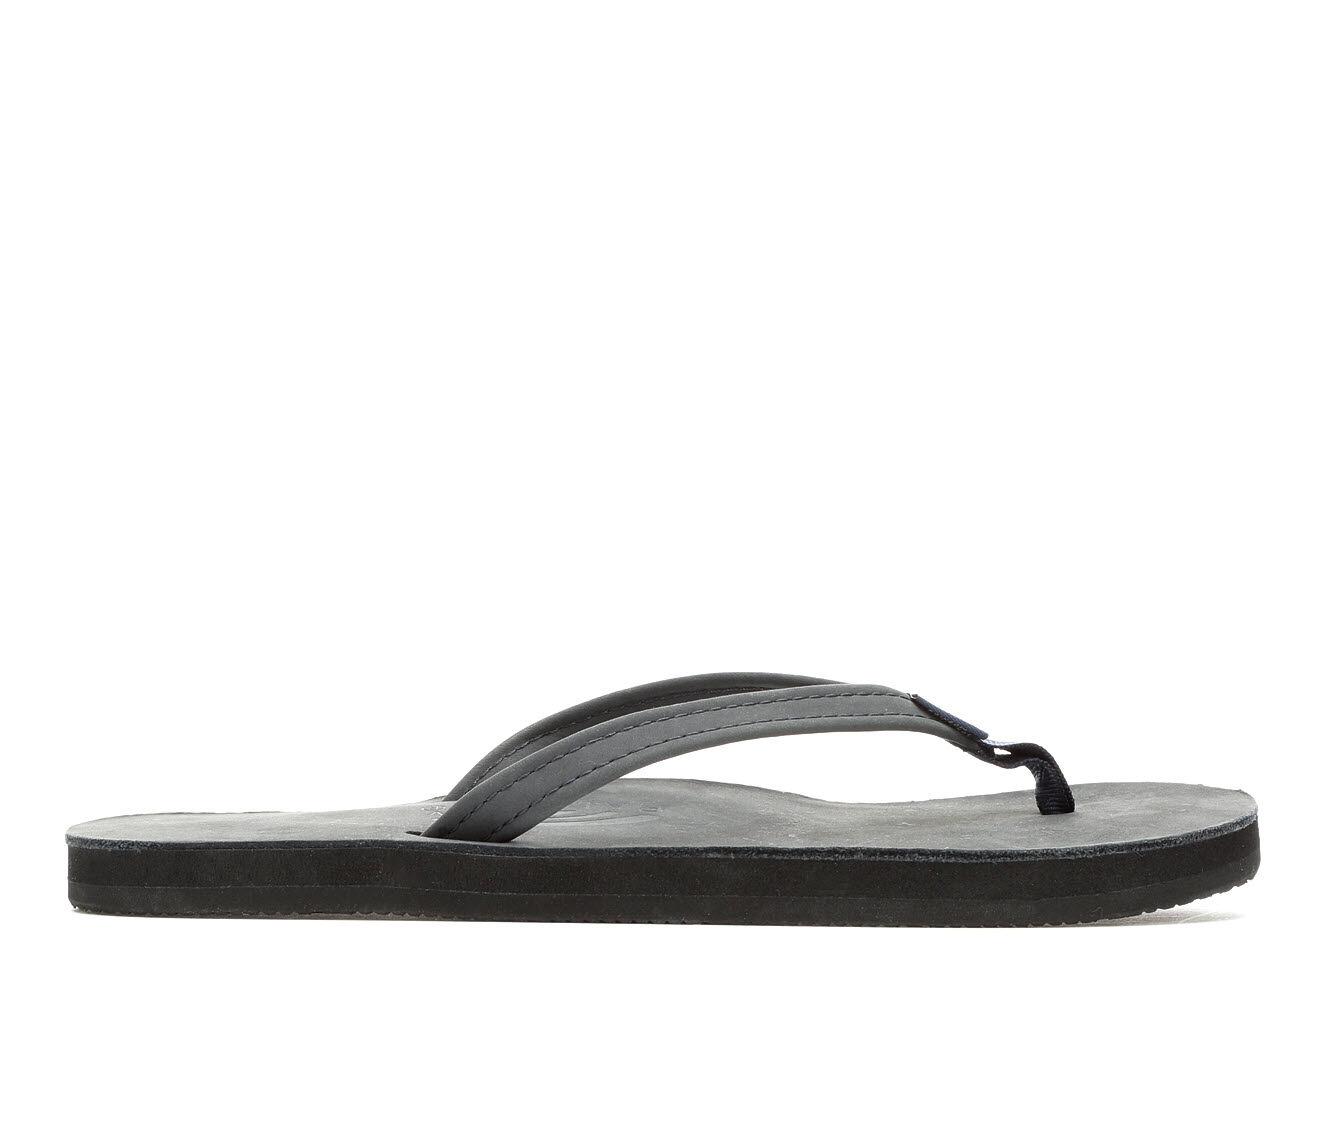 buy authentic Women's Rainbow Sandals Single Layer Premier Leather -301ALTSN Flip-Flops Navy